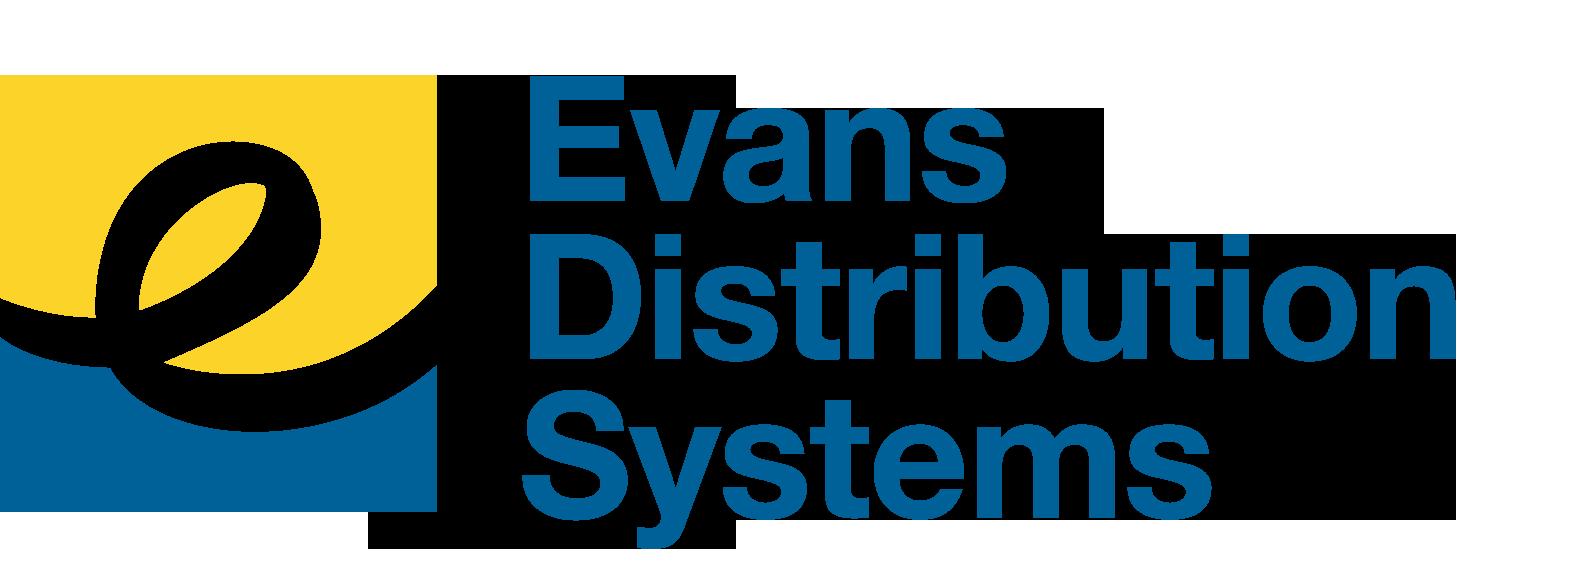 Evans Distribution